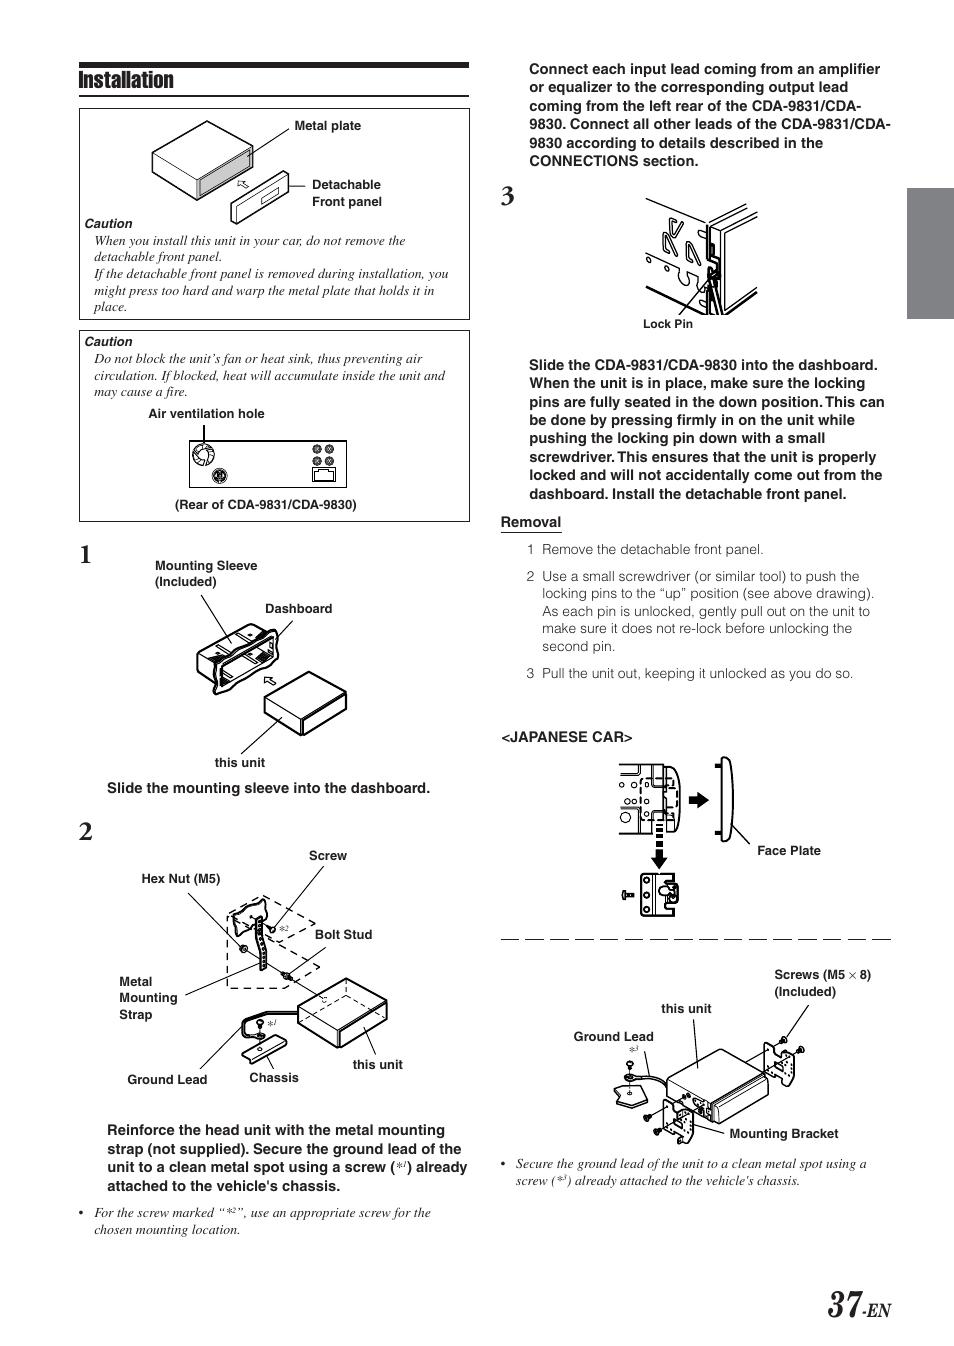 installation alpine cda 9831 user manual page 39 42 original rh manualsdir com Alpine CDA 9853 Manual Alpine CDA 9853 Manual